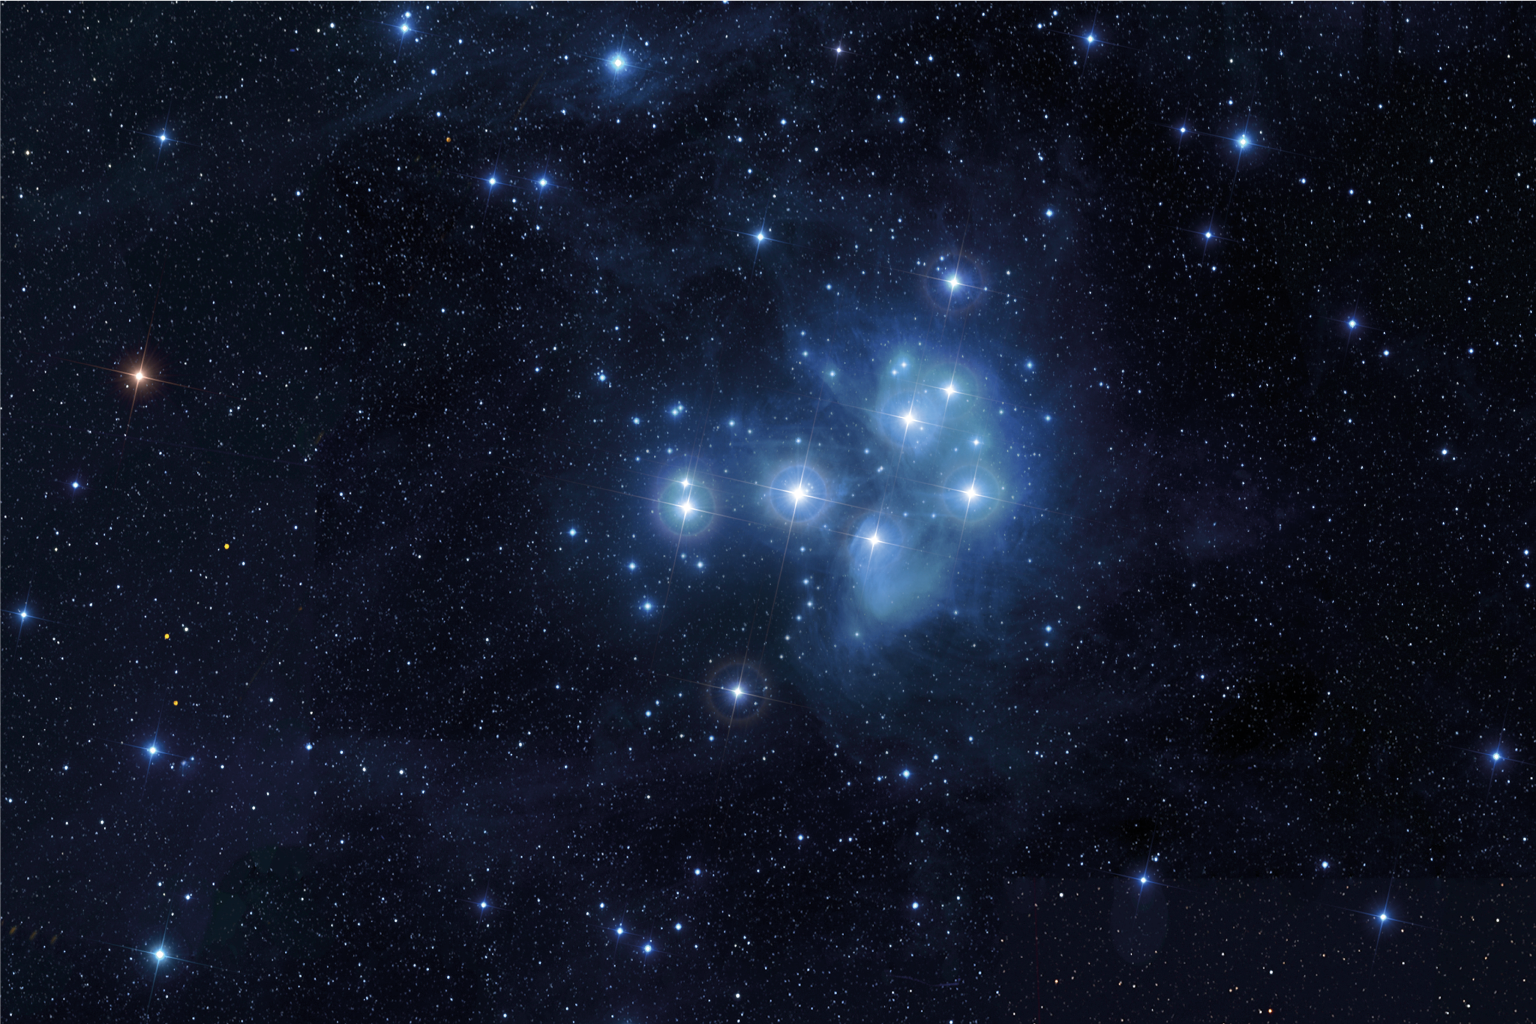 Le Pleiadi  The Pleiades     Credits: Baldas1950/shutterstock.com